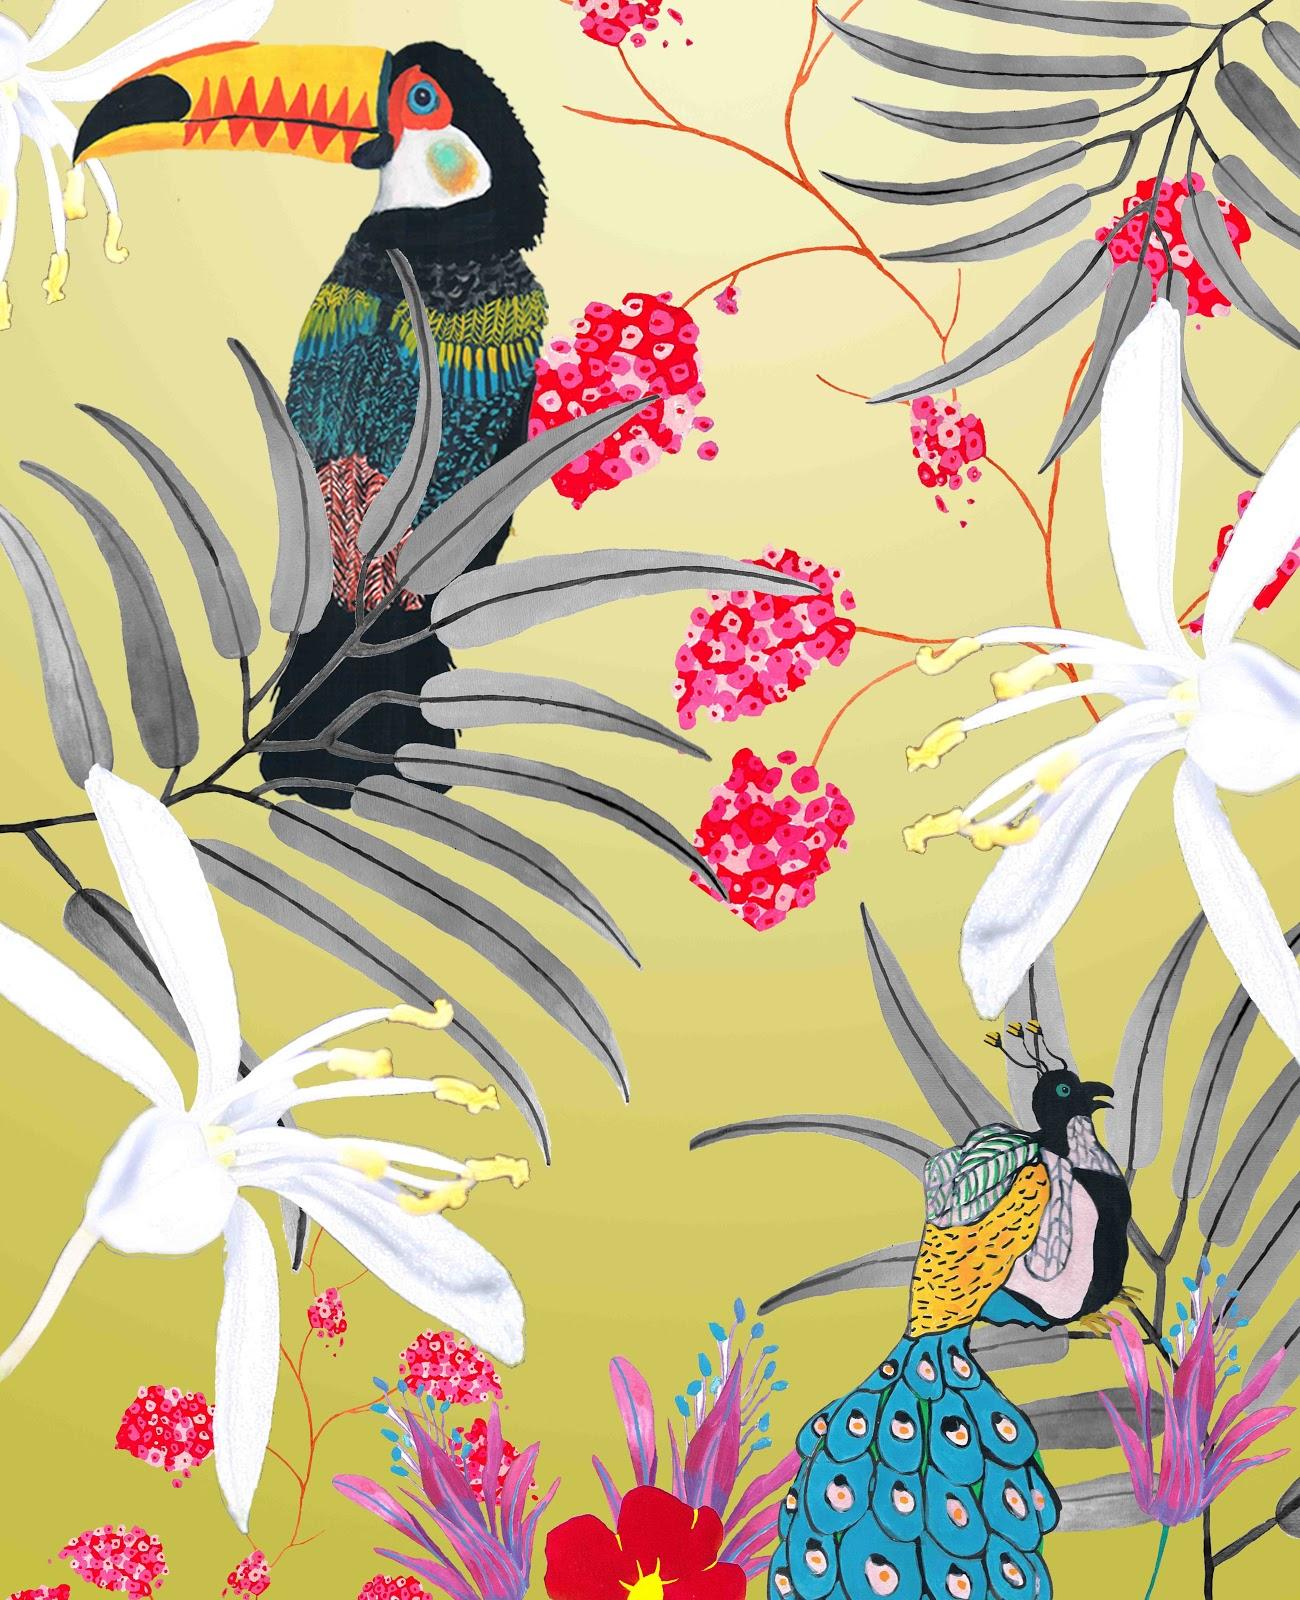 Wallpaper With Bird Designs Wallpapersafari